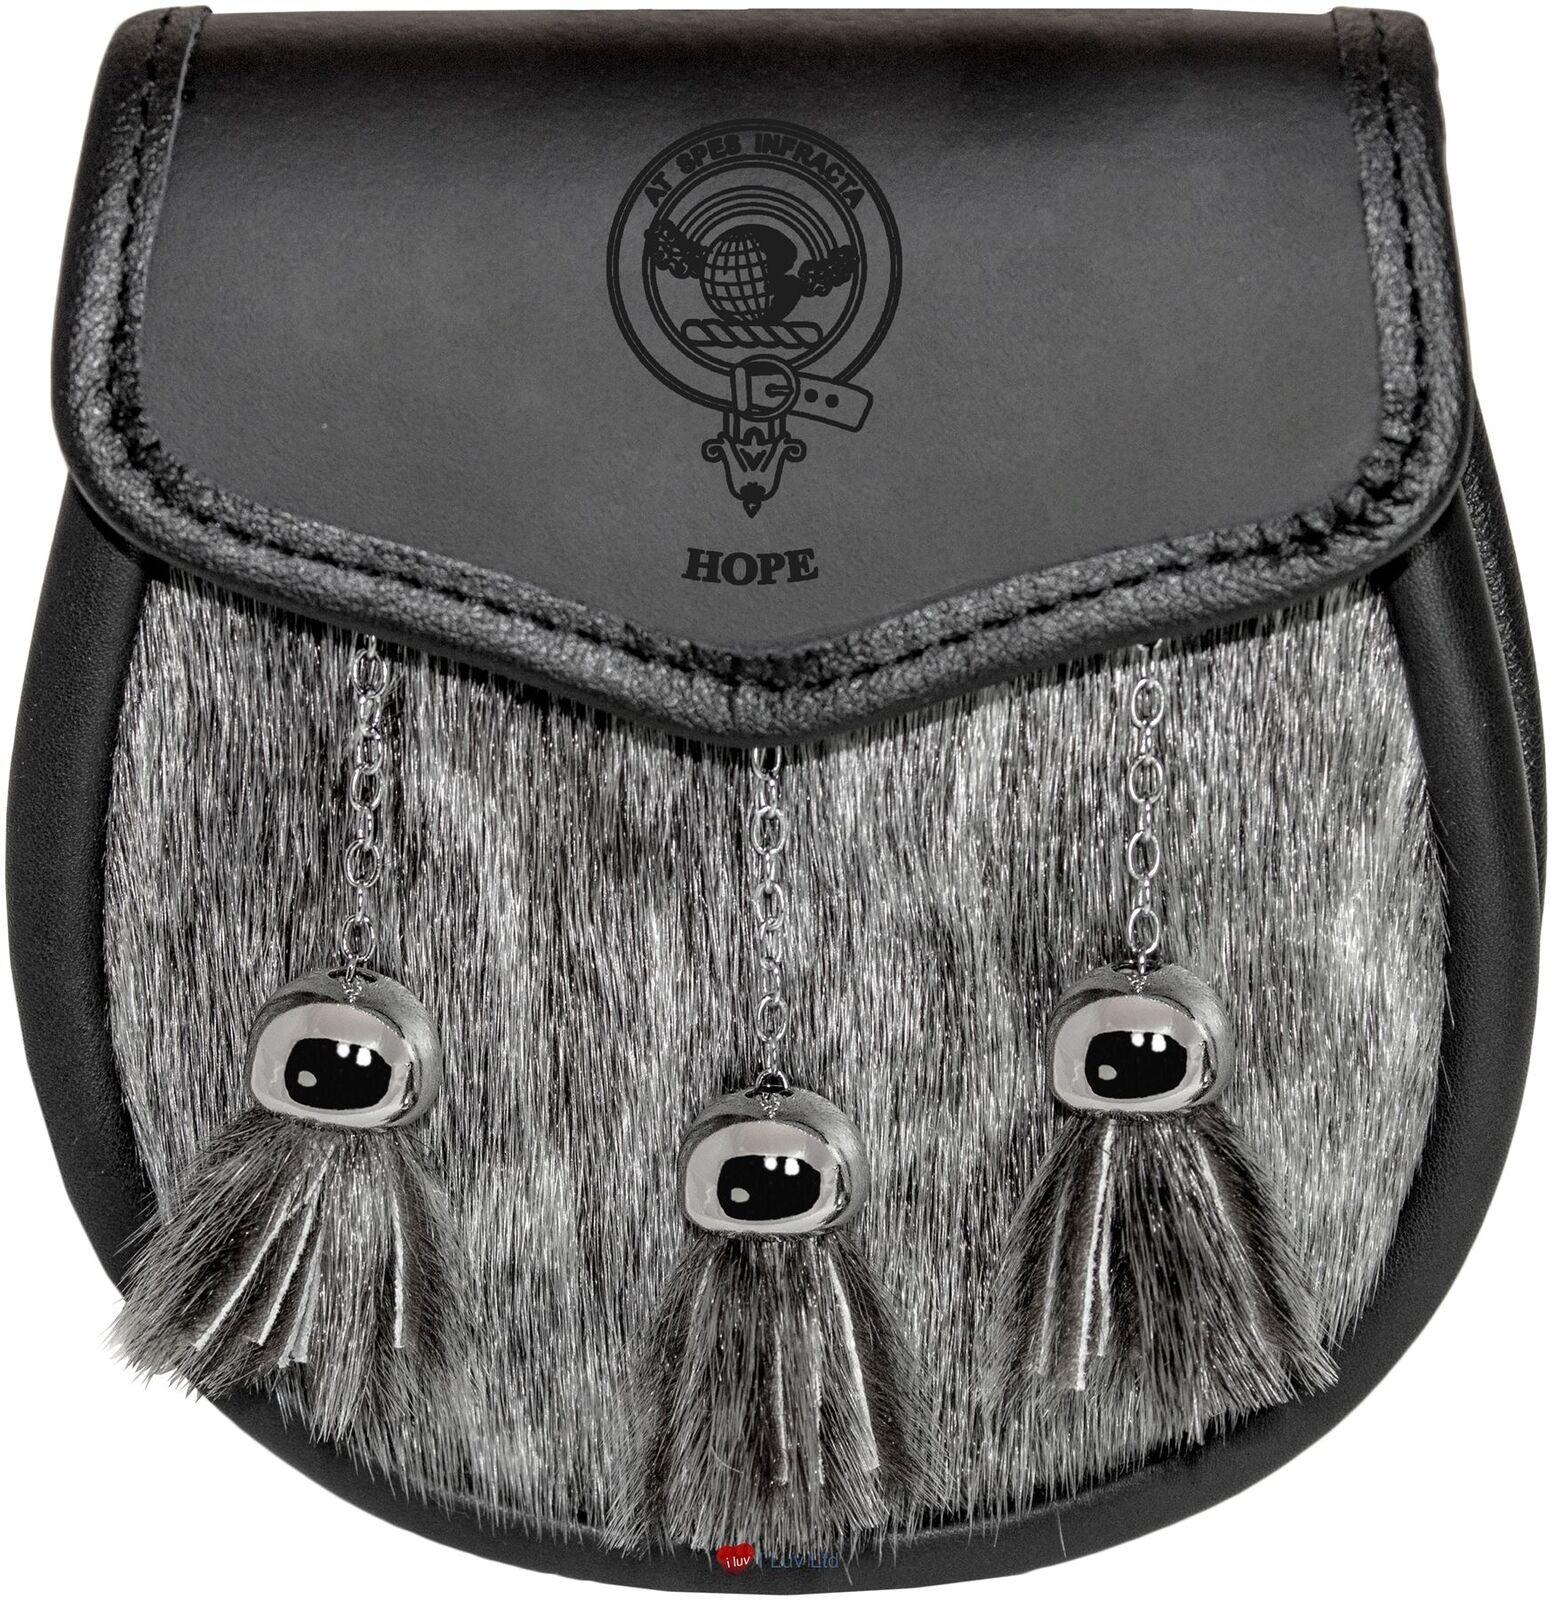 Hope Semi Dress Sporran Fur Plain Leather Flap Scottish Clan Crest